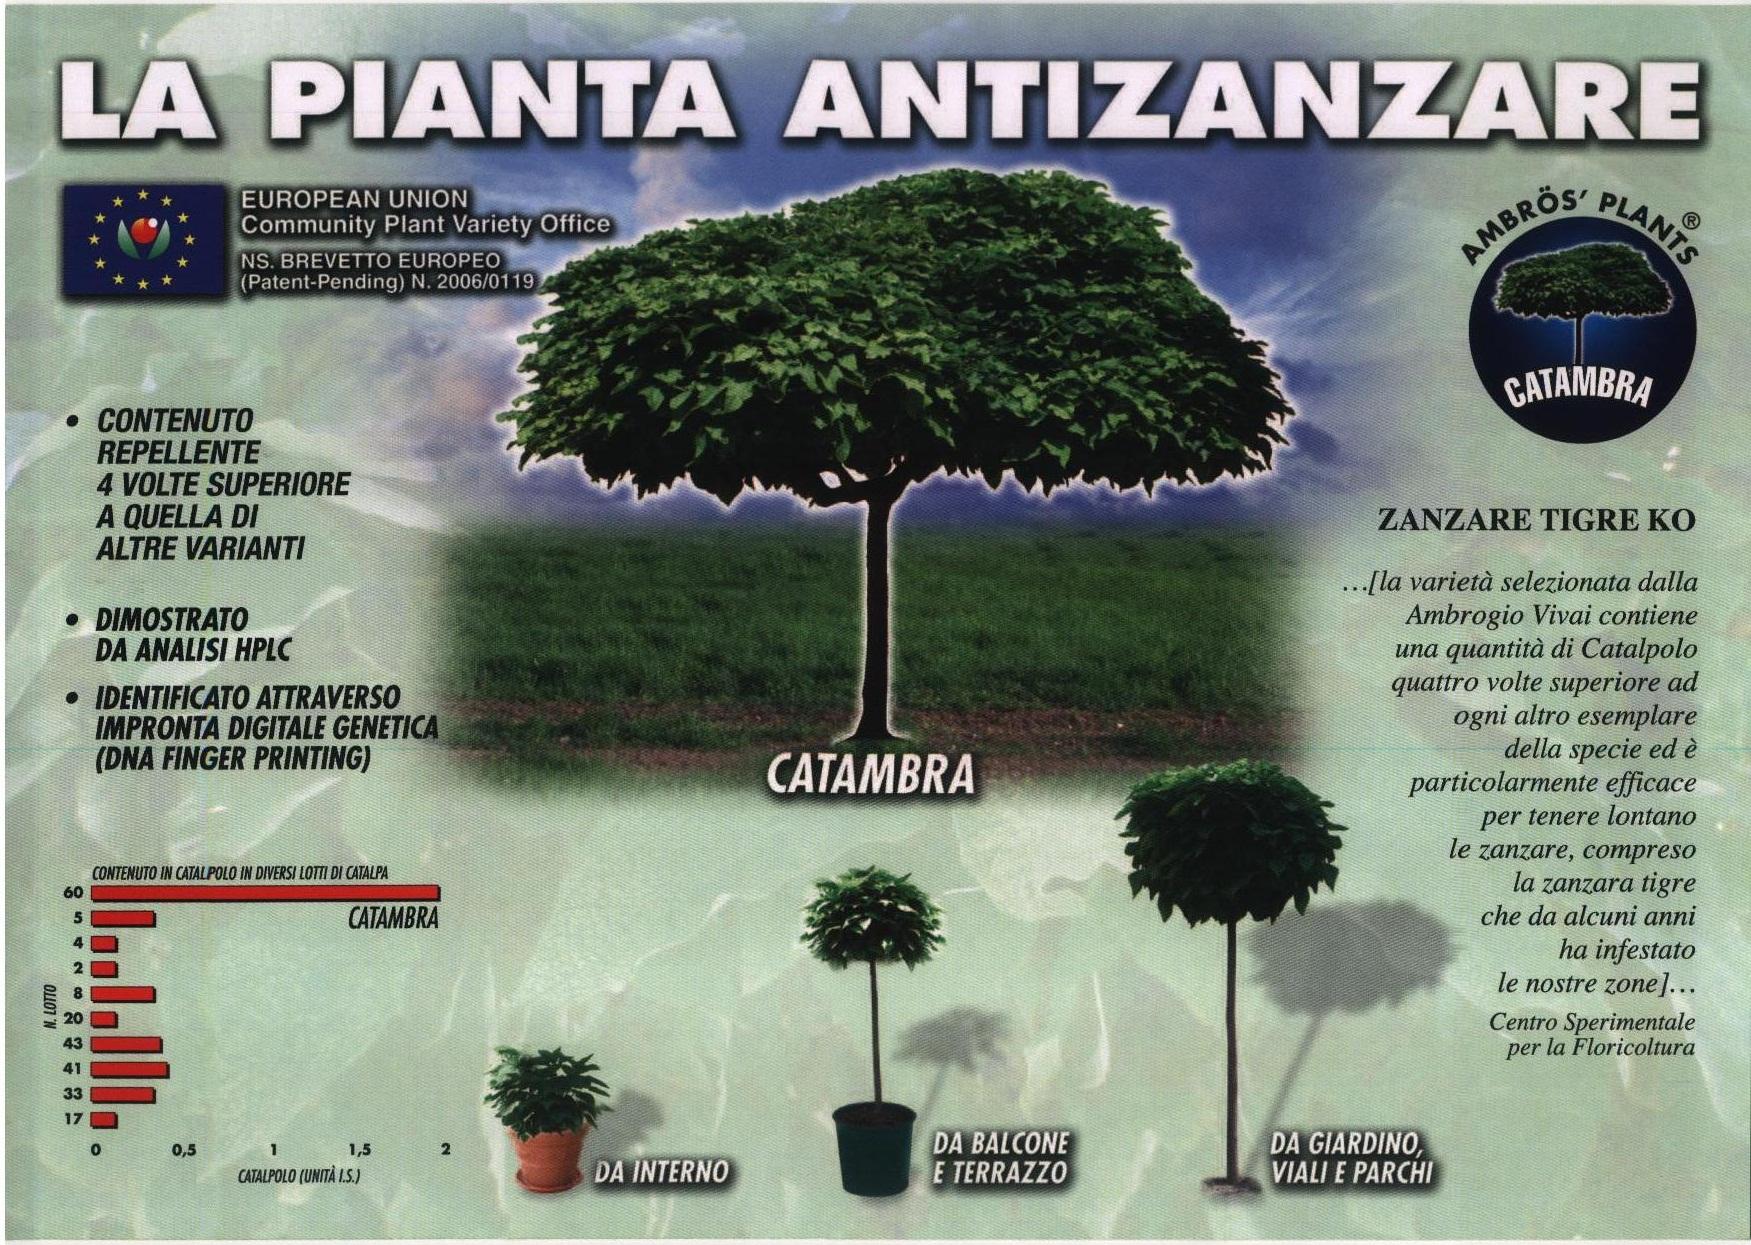 Catambra, la pianta antizanzare! - Blog Vivaio Di Bert